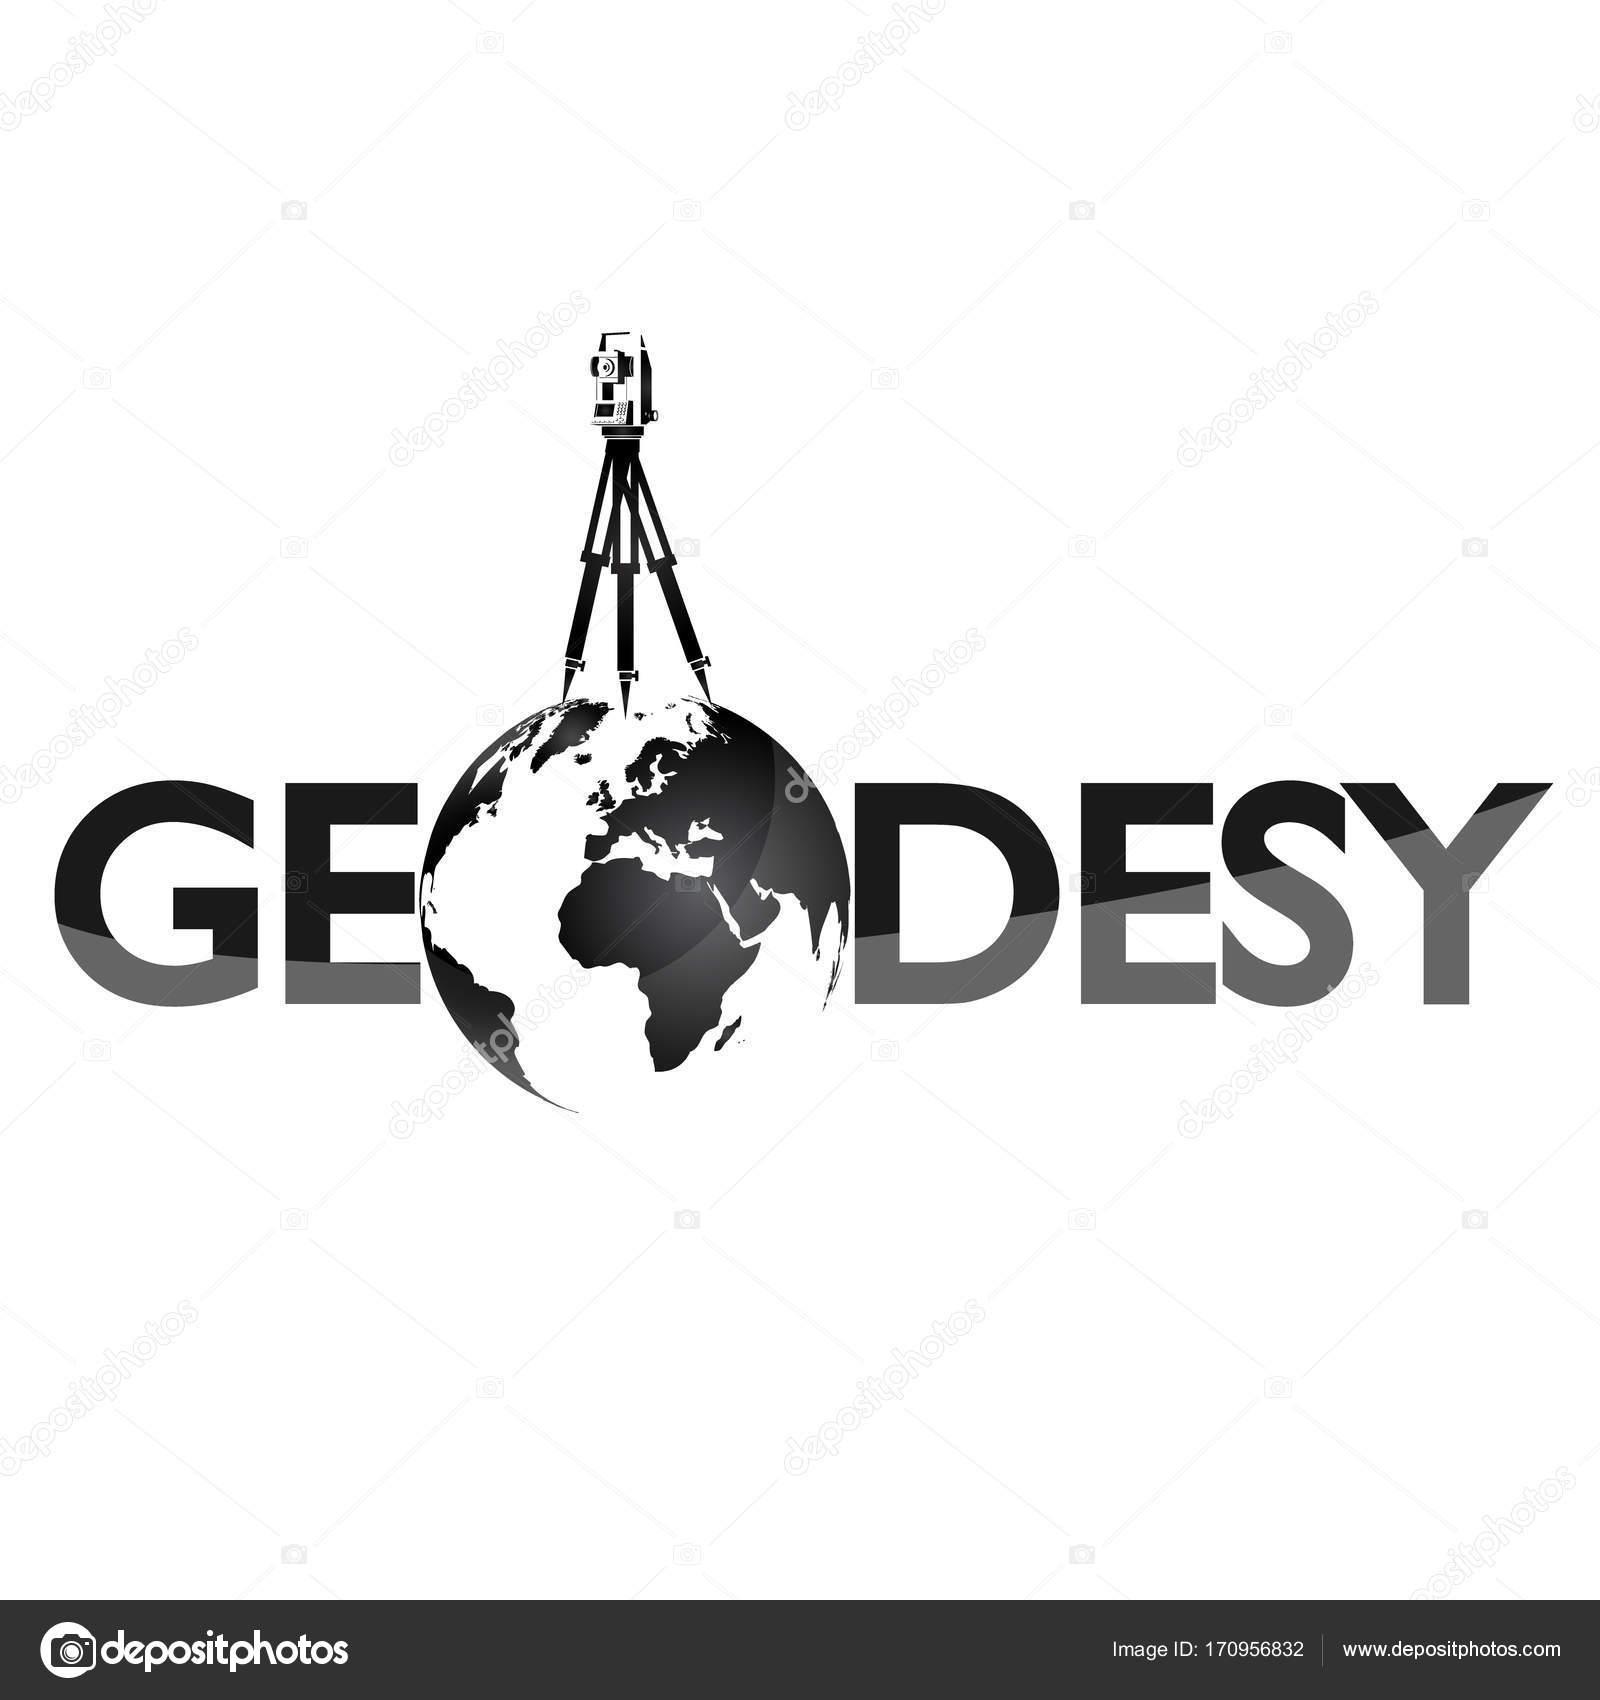 Geodesy symbol for surveyor stock vector john1279 170956832 geodesy symbol for surveyor stock vector buycottarizona Image collections